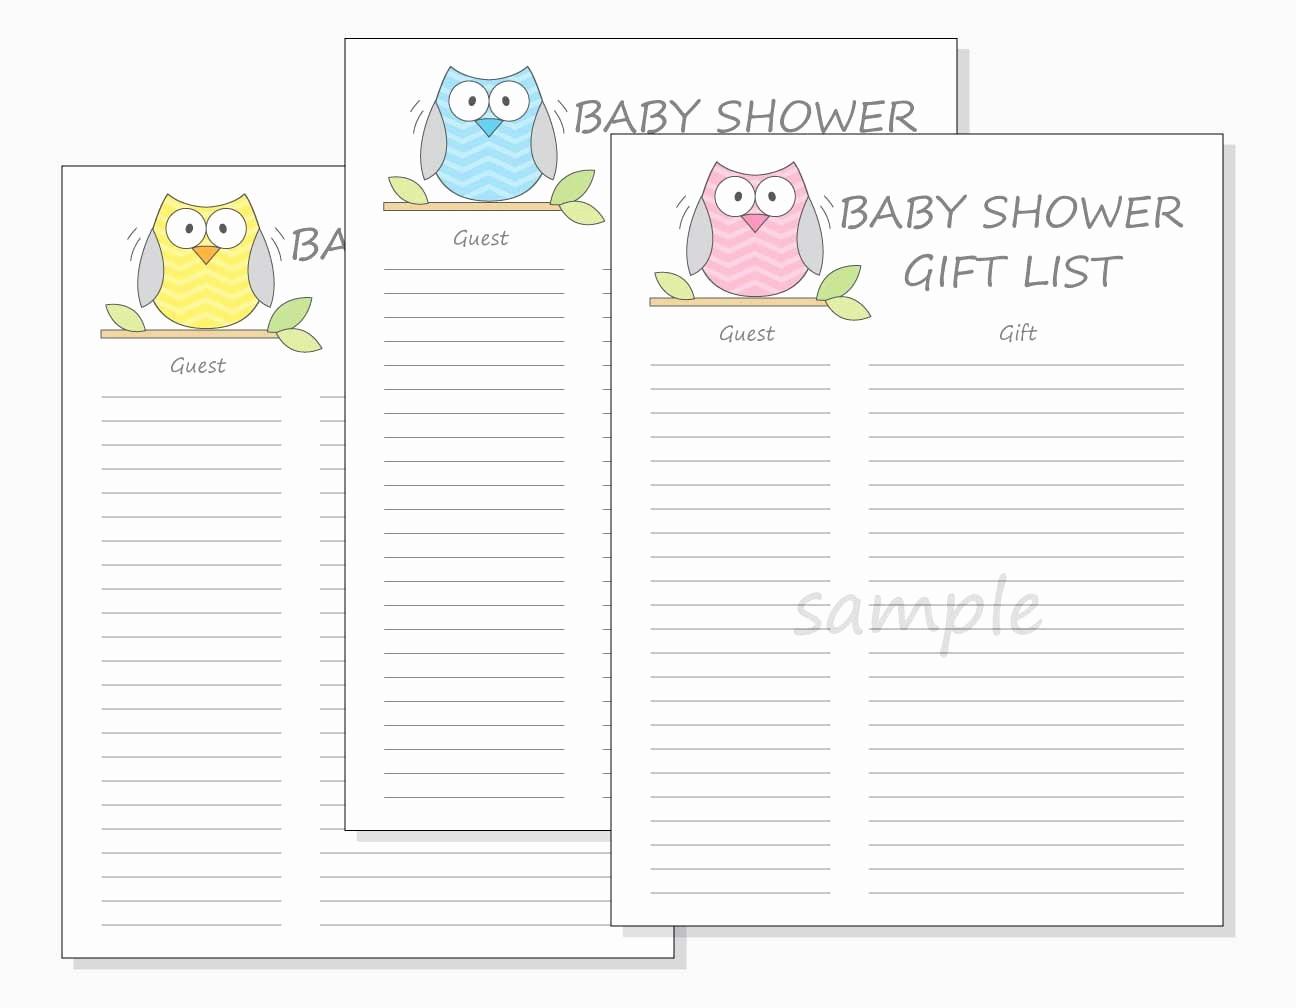 Printable Baby Shower Guest List Luxury Diy Baby Shower Guest Gift List Printable Chevron Owl Design